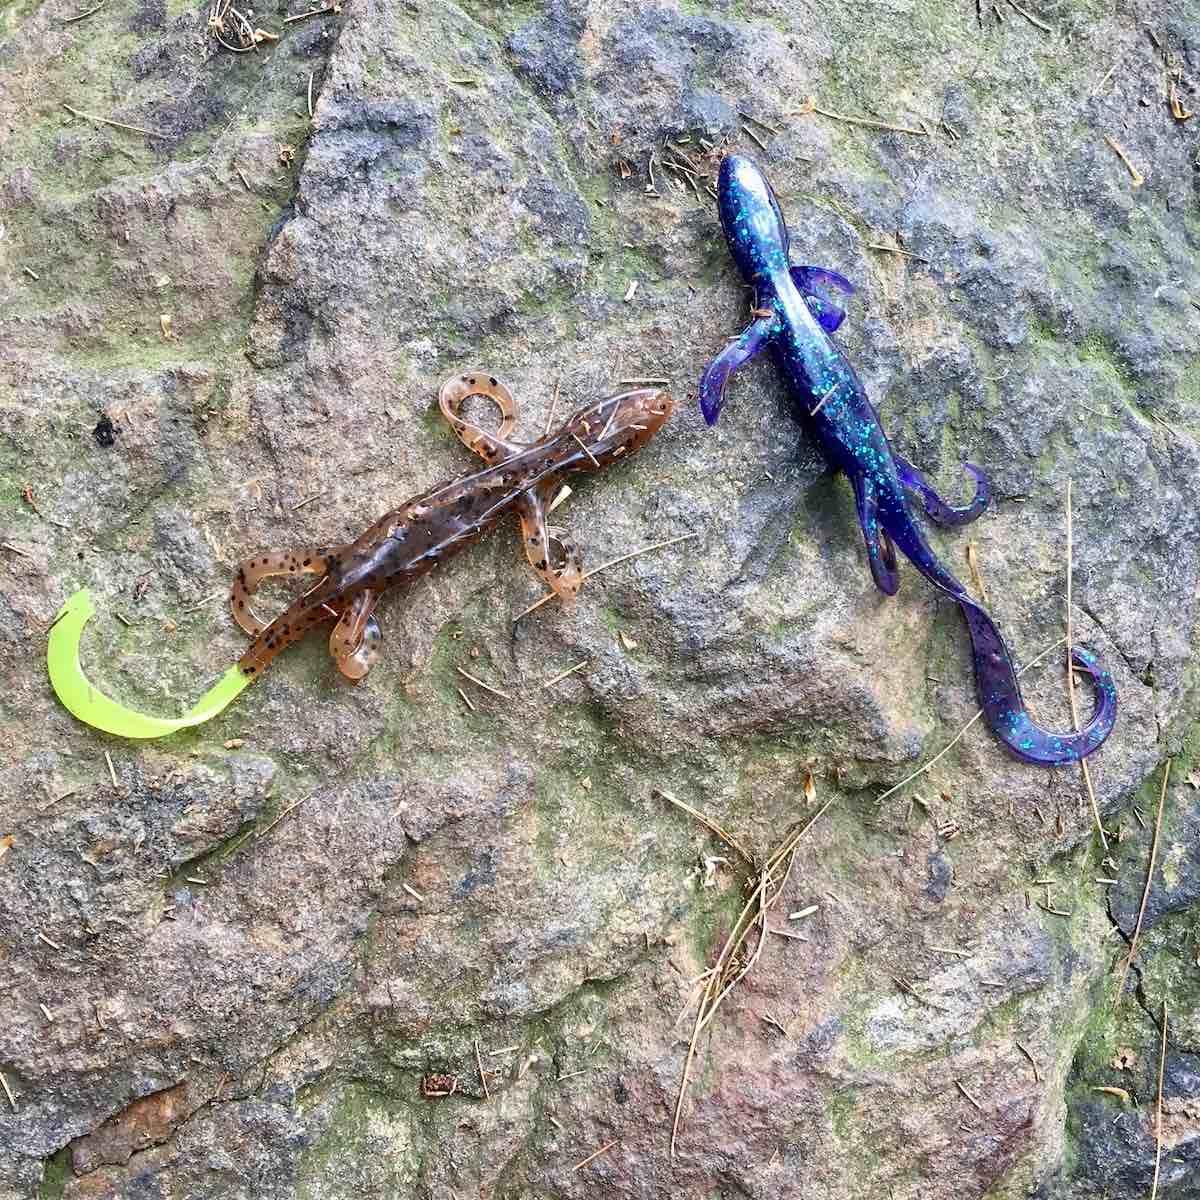 Lake Elise fishing gear left behind on a rock